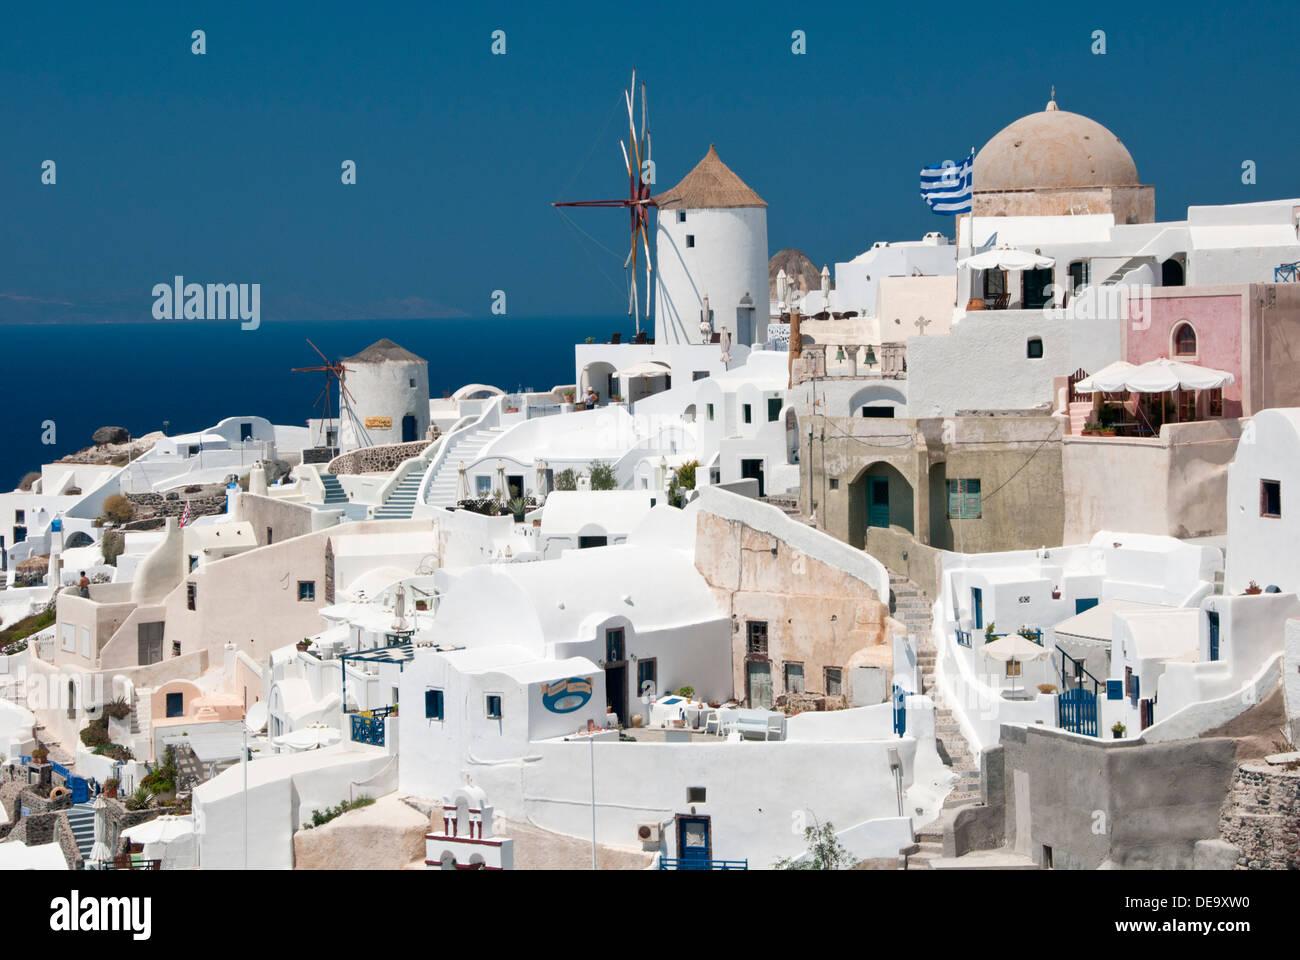 Windmills & Whitewashed Traditional Houses, Oia, Santorini, Greek Islands, Greece, Europe - Stock Image